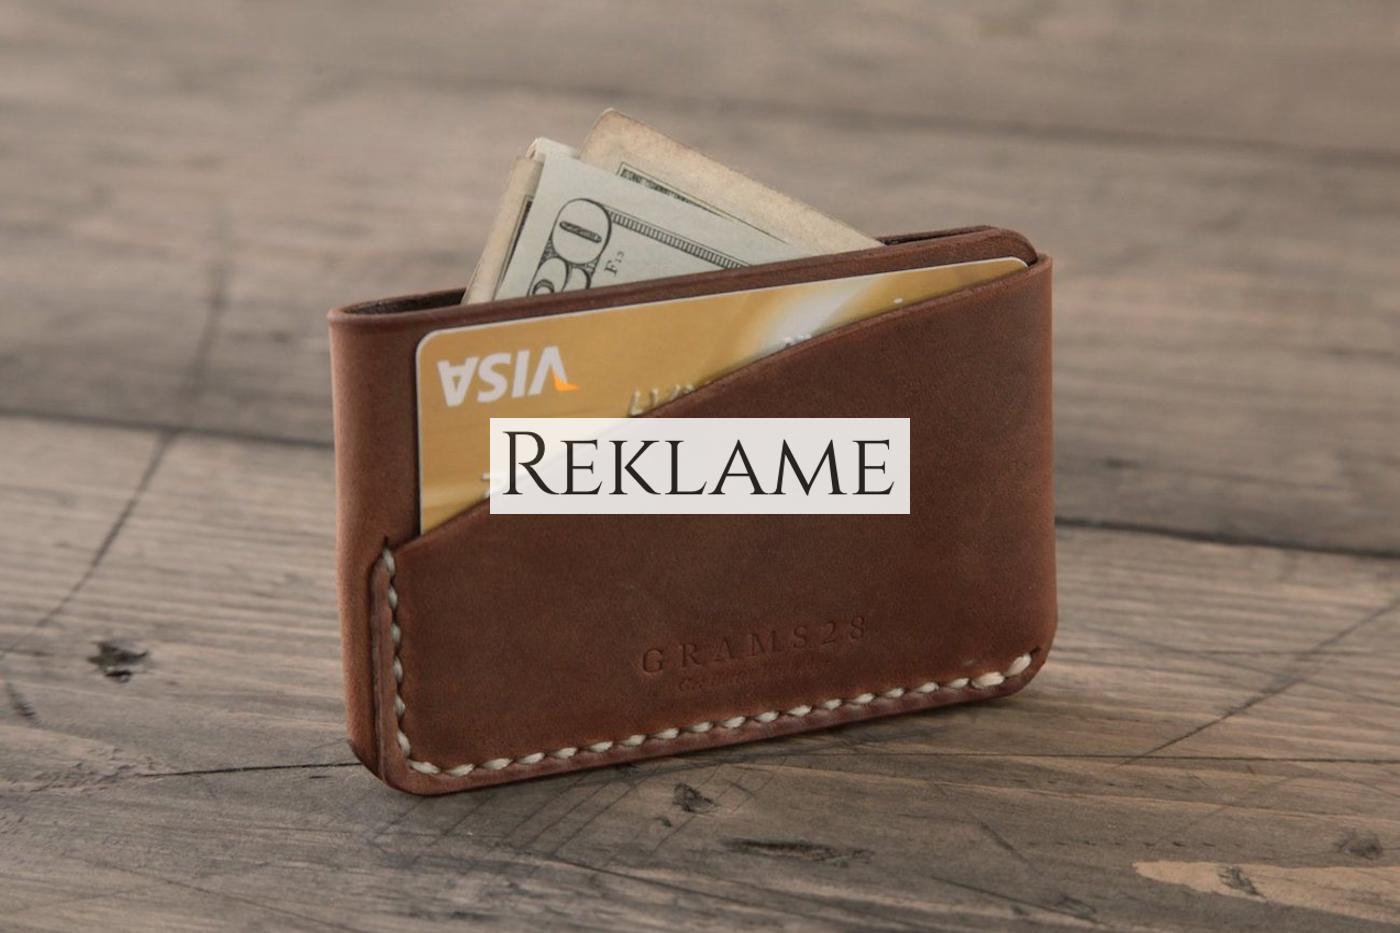 kreditkortholder i læder